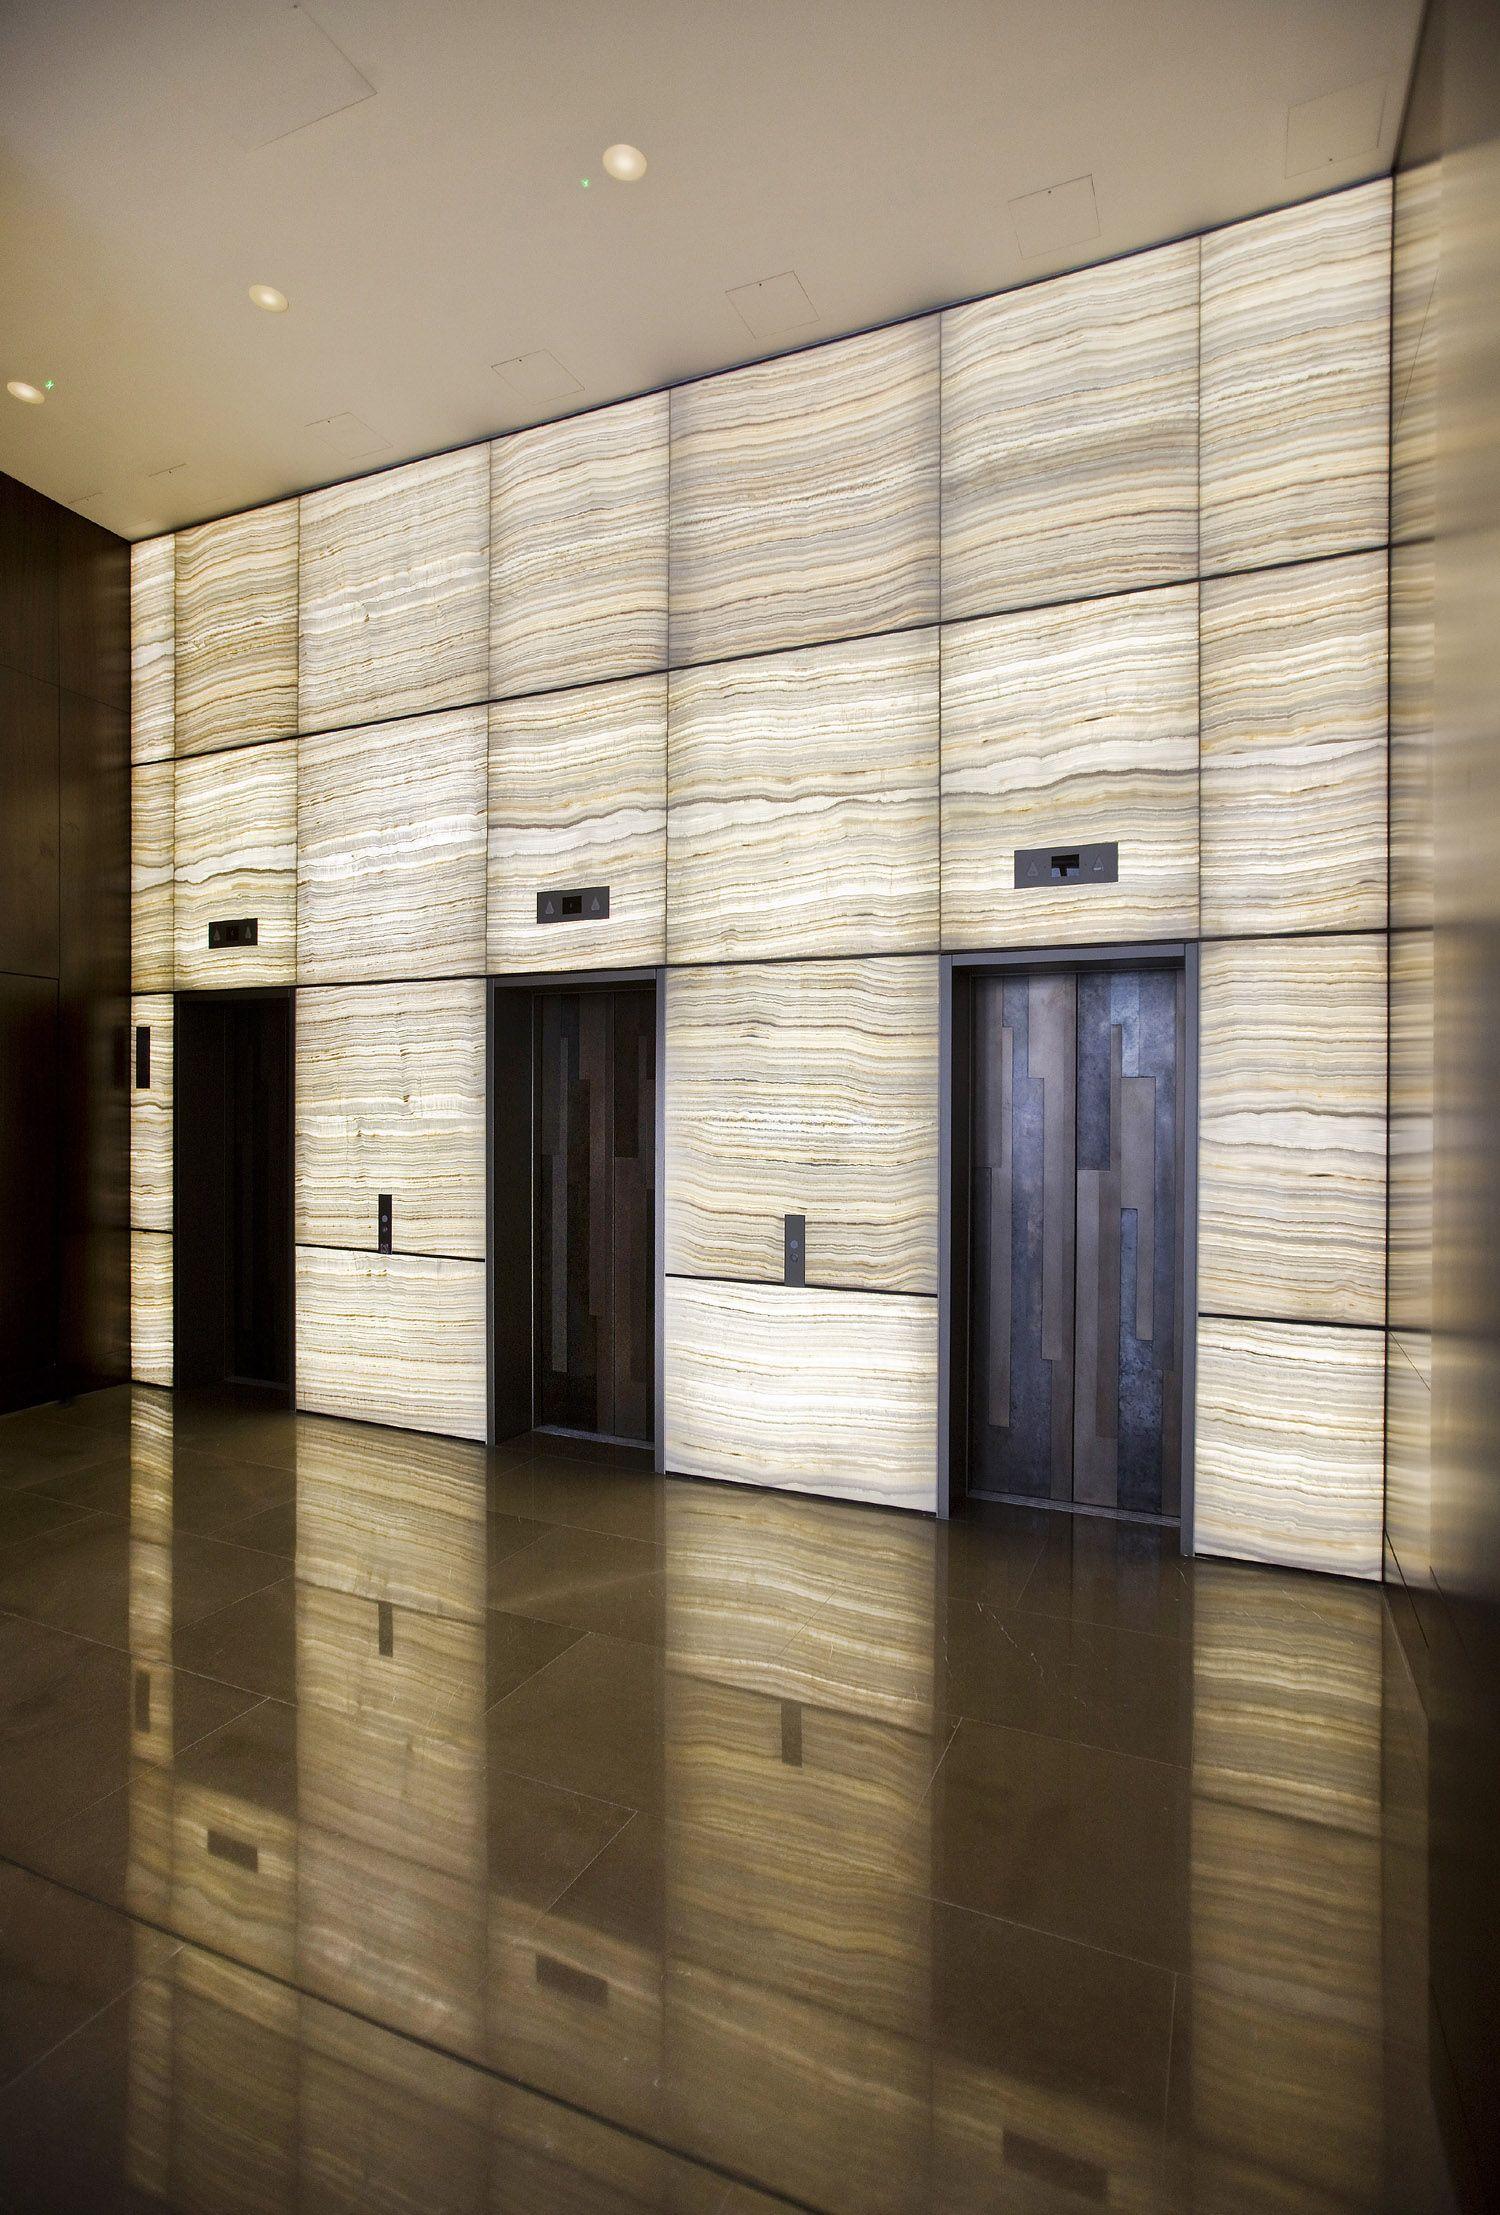 Riets Bruinsma, Wimpole Street | Architectural Lighting | Pinterest ...